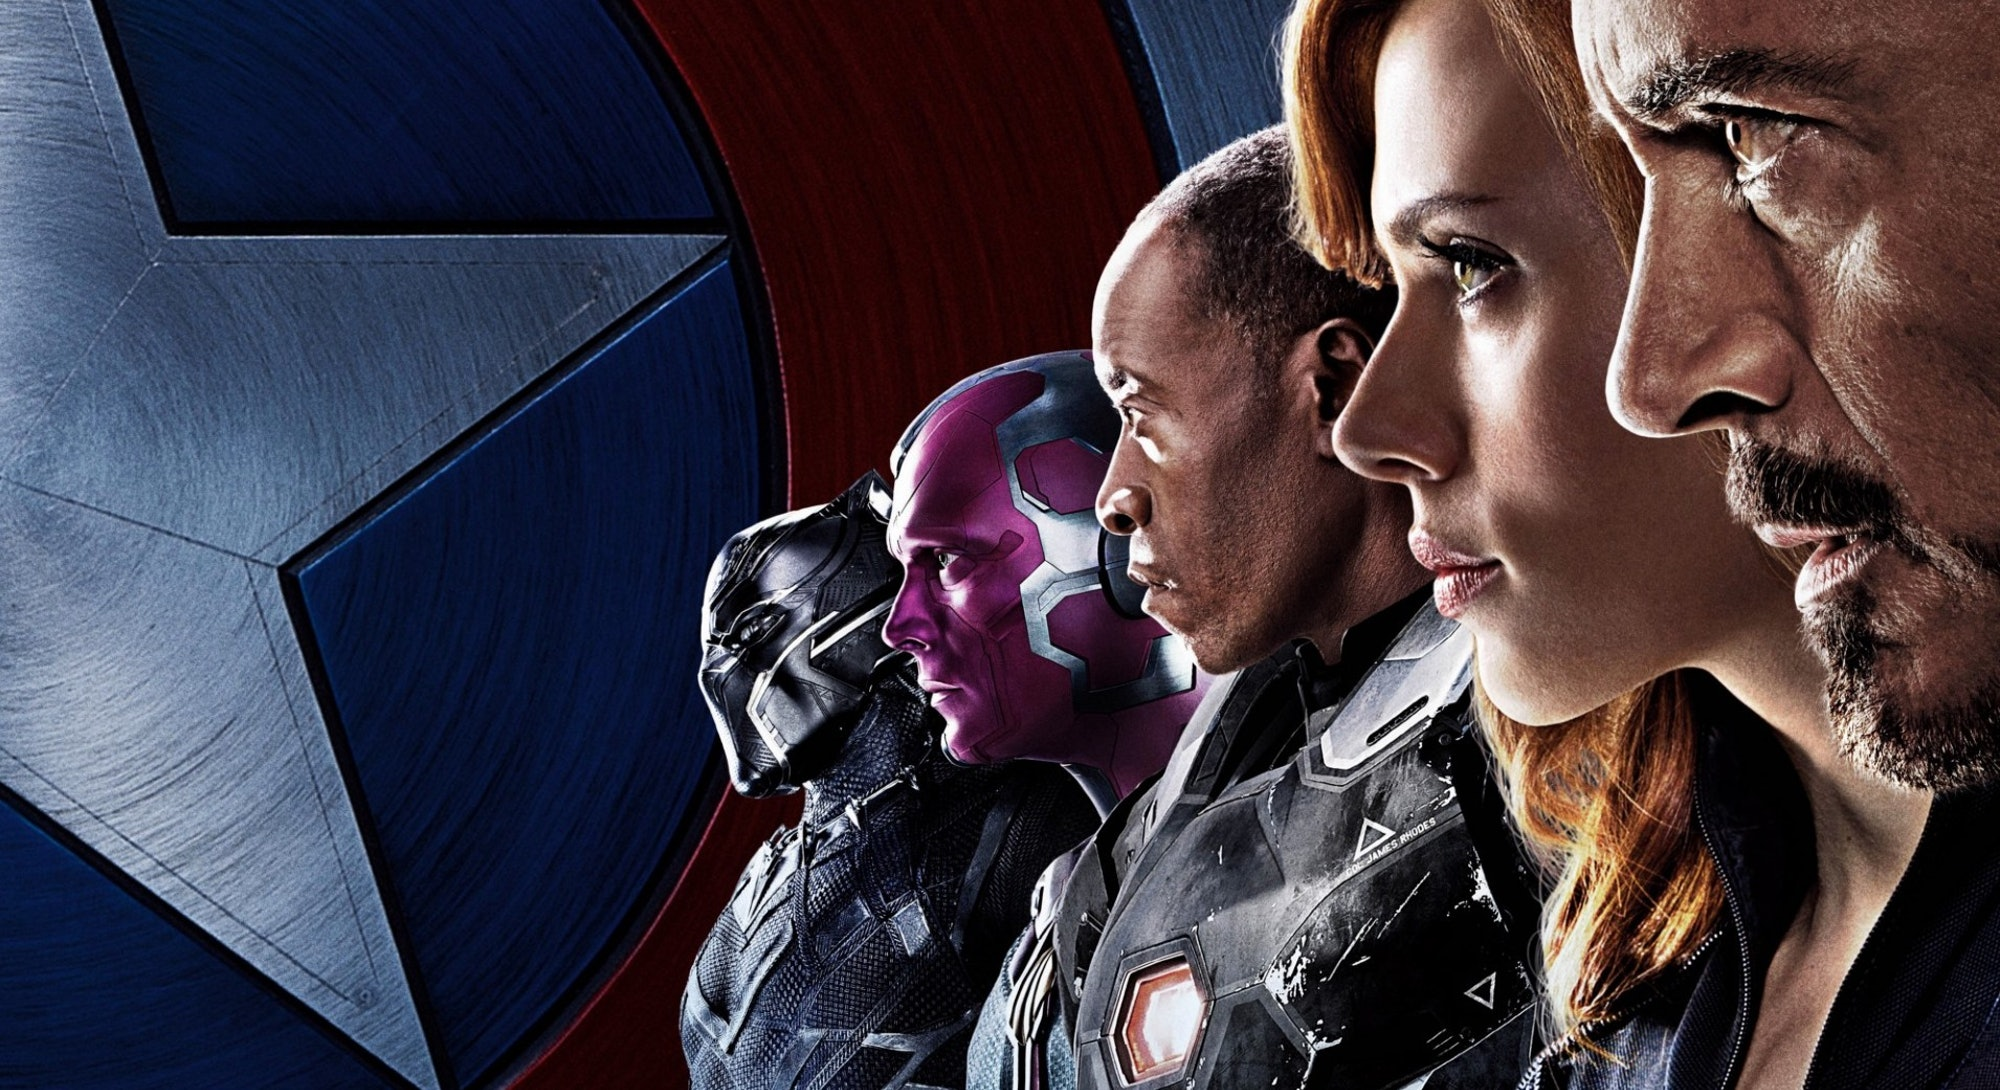 half of captain america civil war character poster facing left